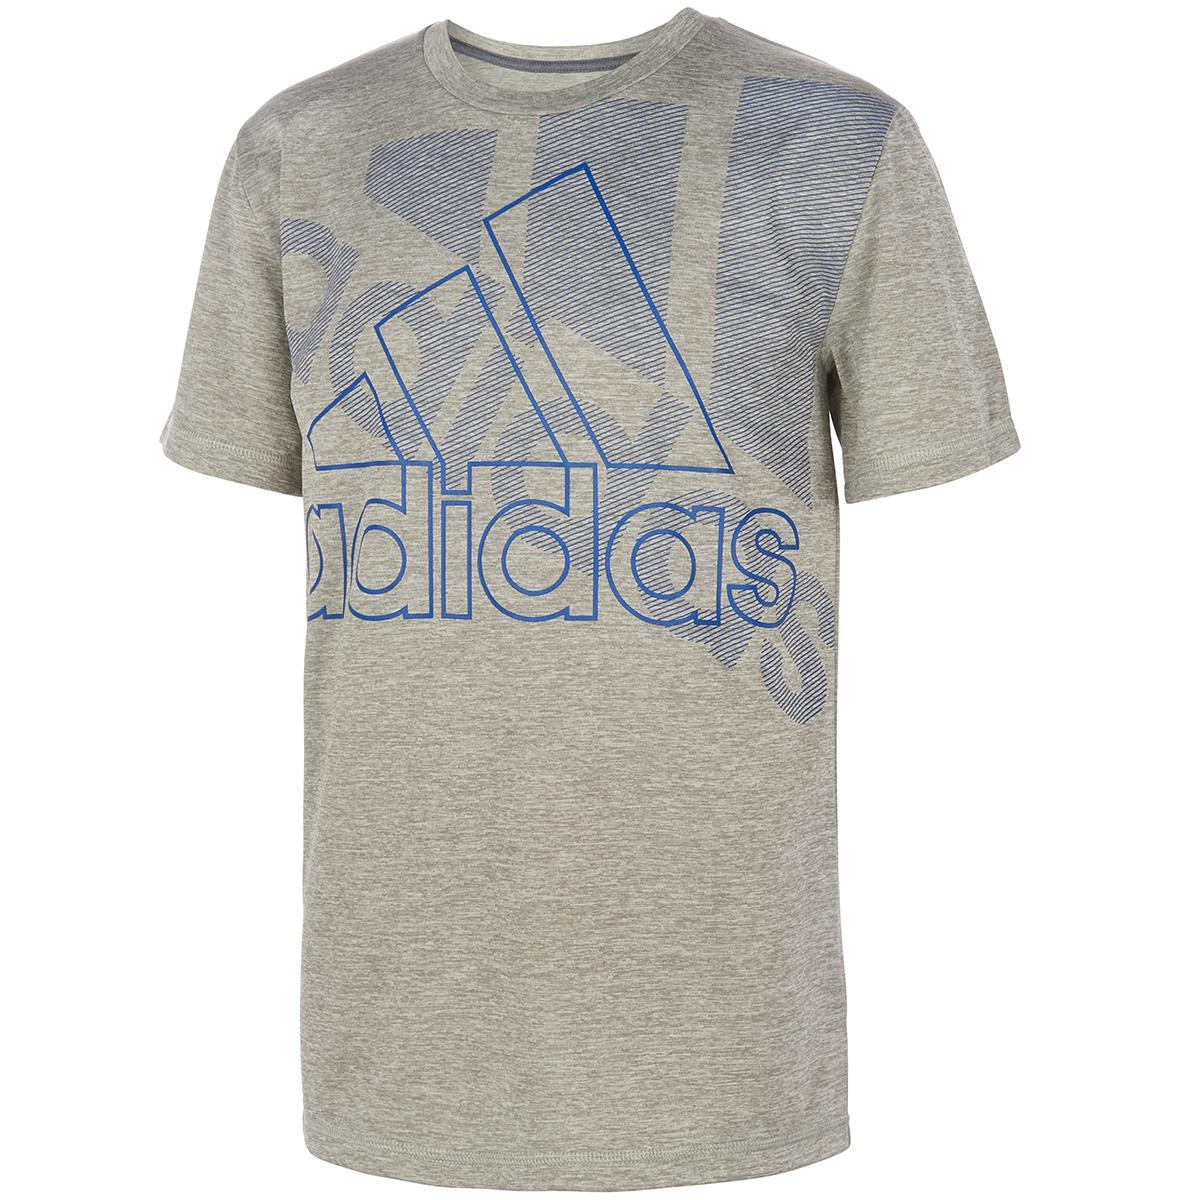 Adidas Little Boys' Short-Sleeve Badge Of Sport Tee - Black, 7